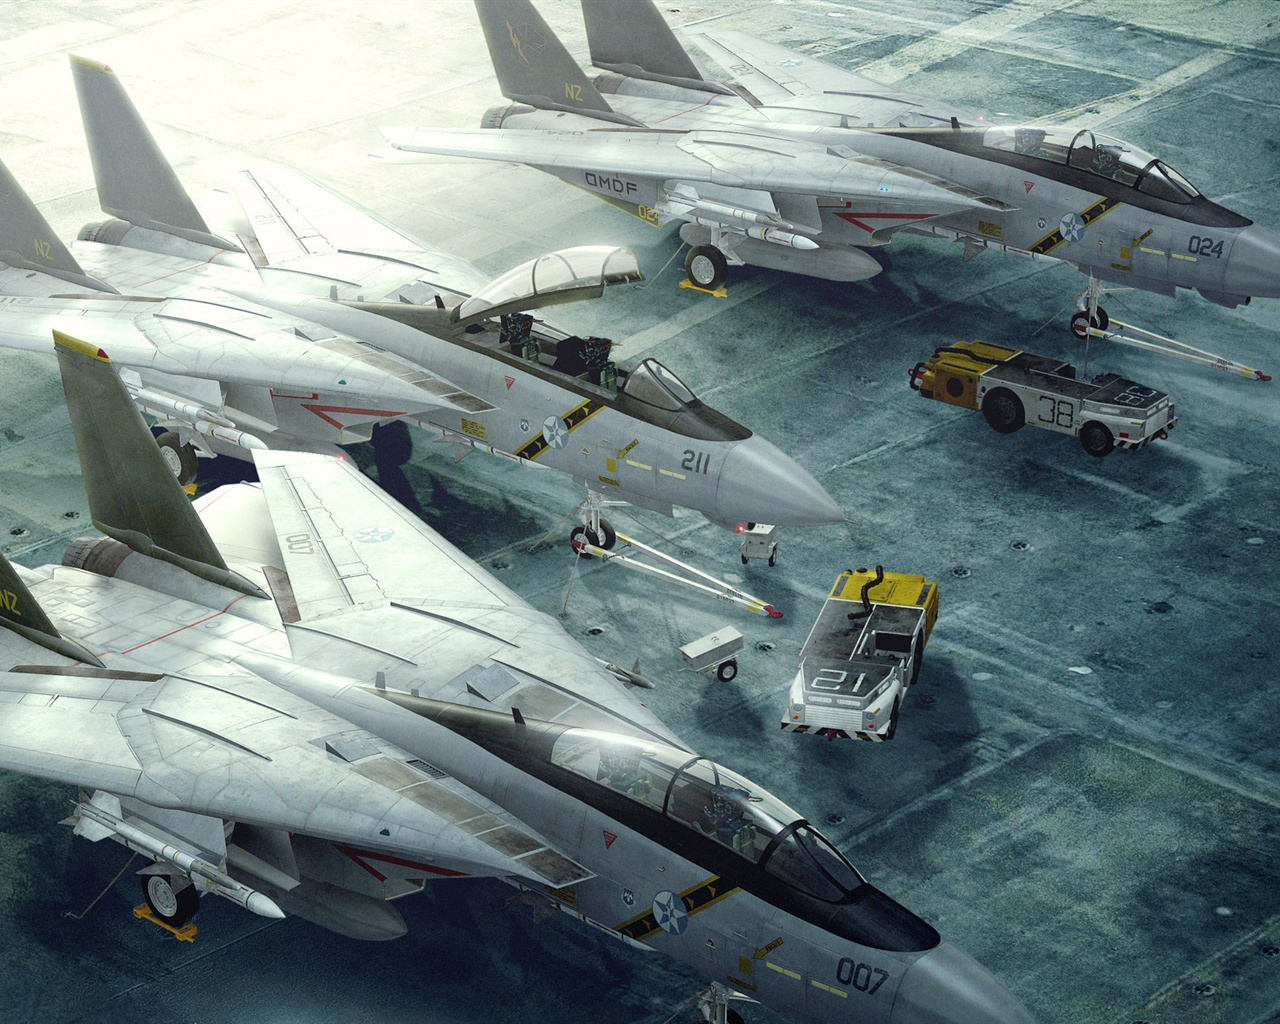 F 14 (戦闘機)の画像 p1_31